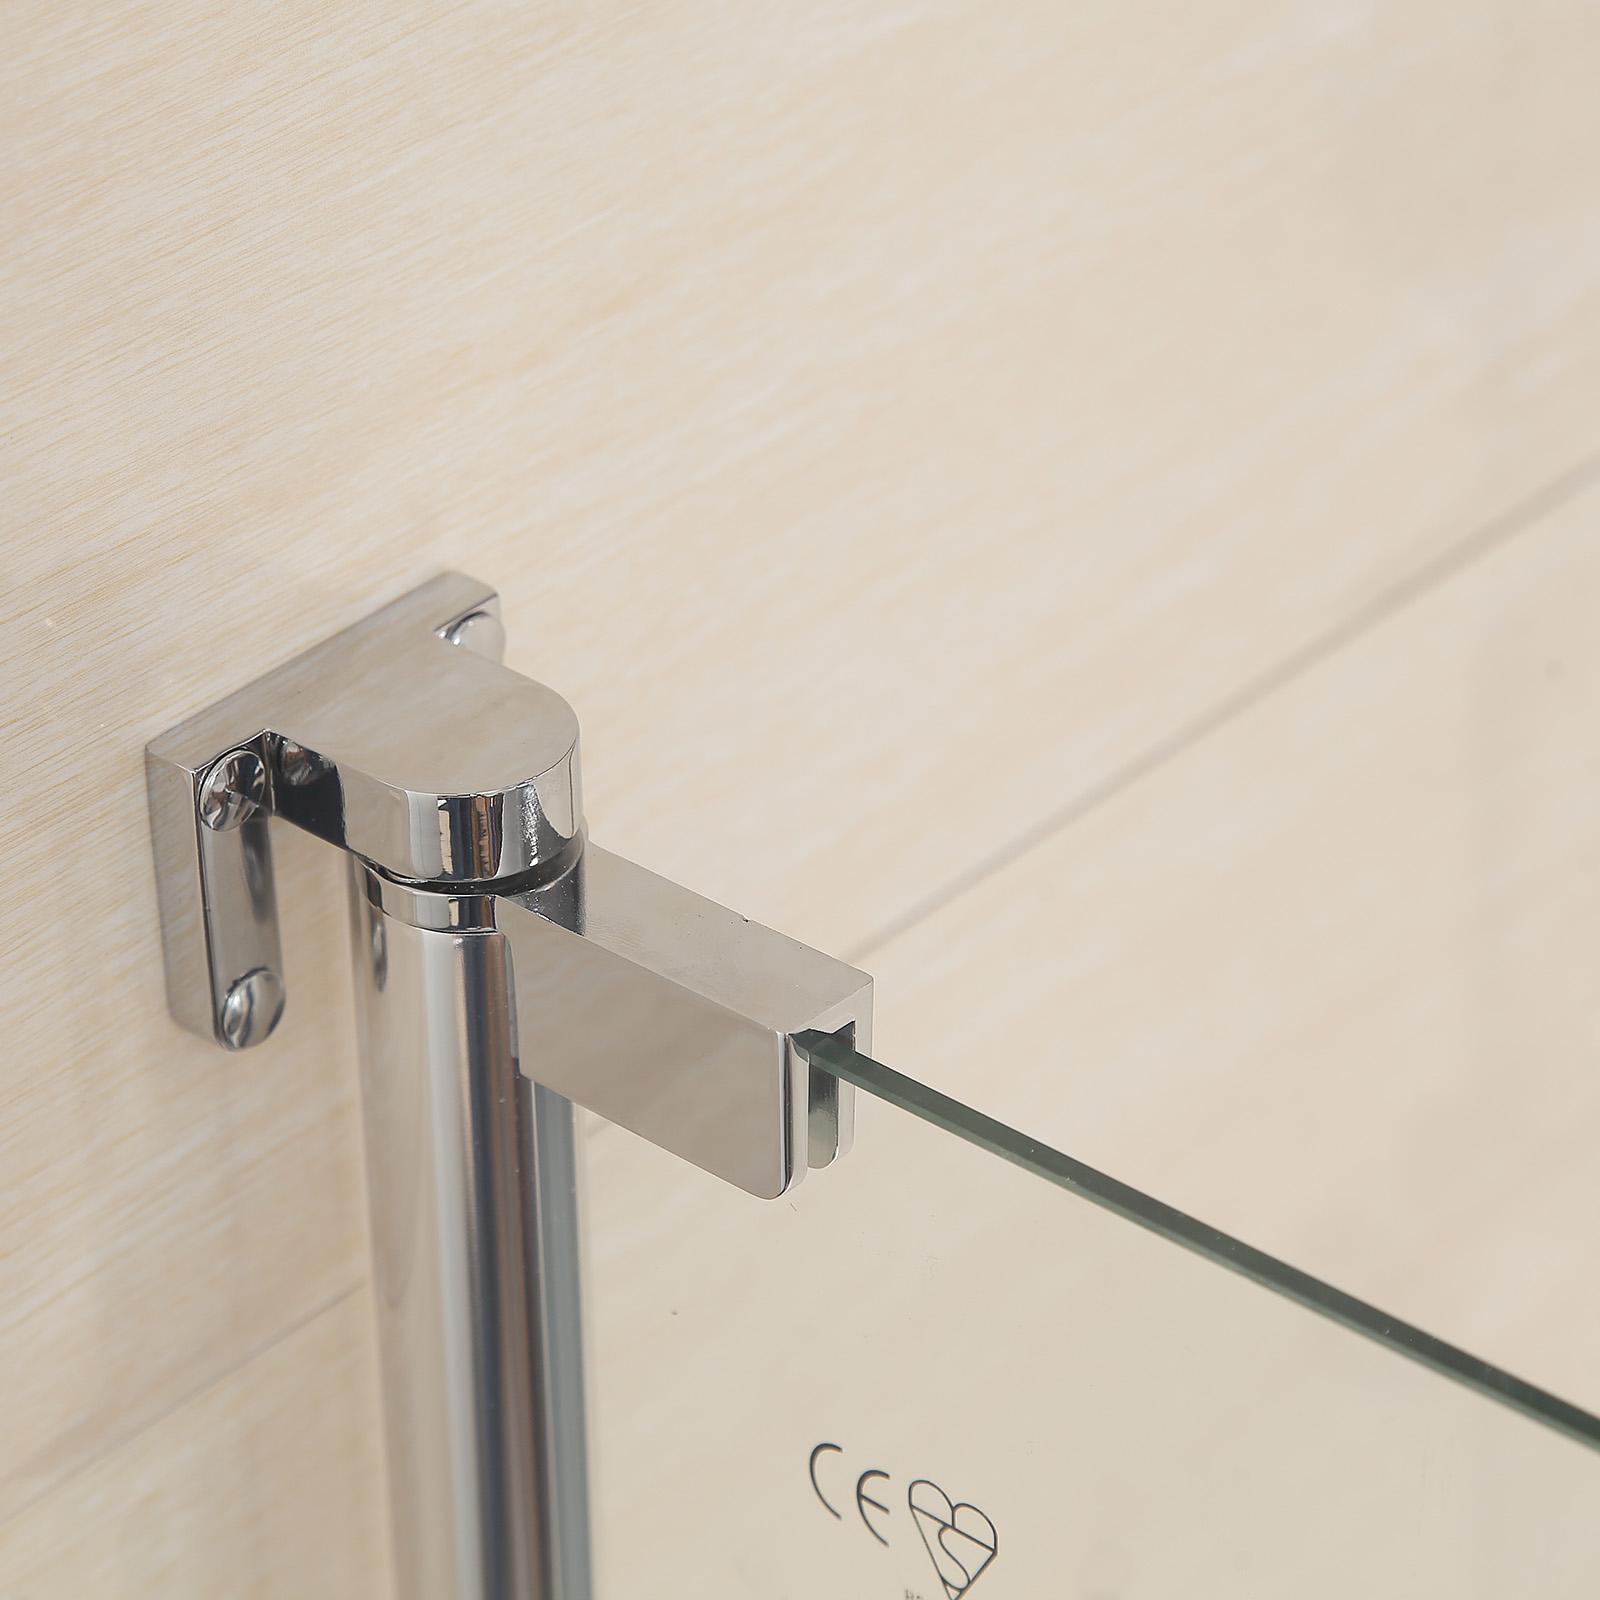 bn 180 176 pivot radius frameless glass over bath shower bn 180 176 pivot radius frameless glass over bath shower